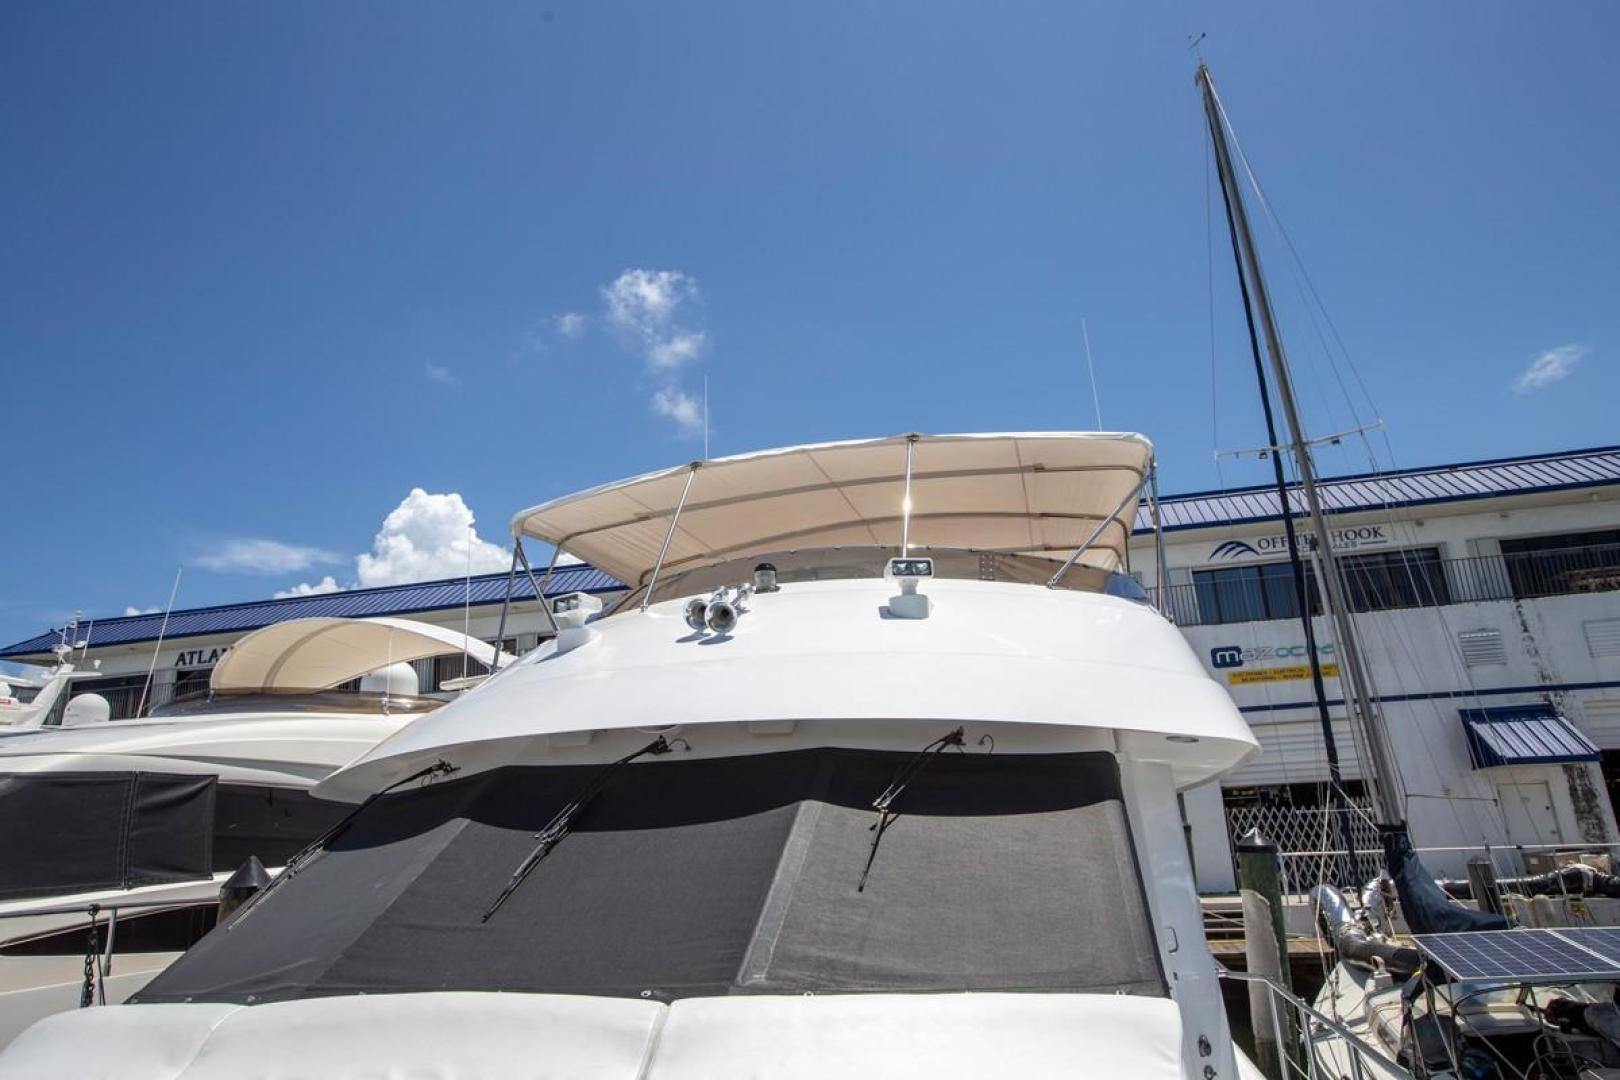 Hatteras-Cockpit Motor Yacht 2000-Getaway Ft. Lauderdale-Florida-United States-977411 | Thumbnail